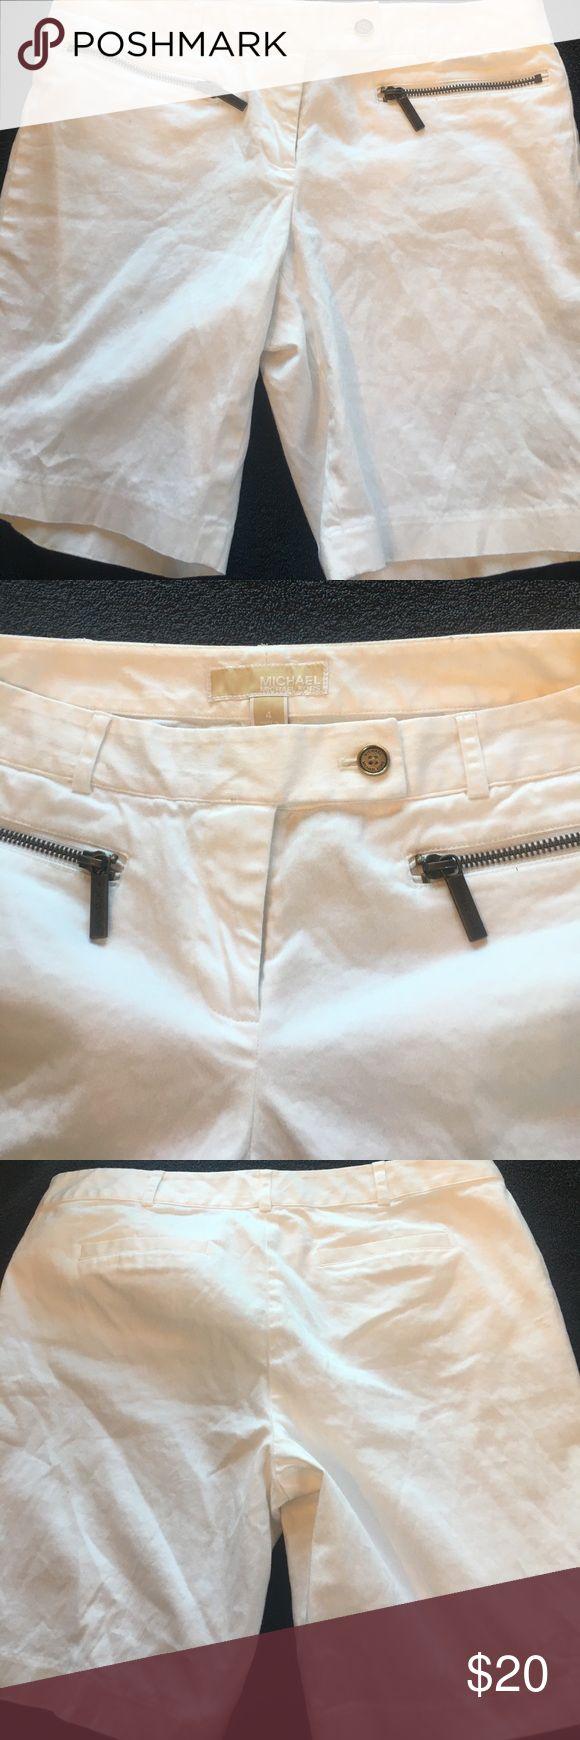 Michael Kors Women's White Shorts Michael Kors Women's White Shorts Size 4 with Zipper pockets KORS Michael Kors Shorts Bermudas